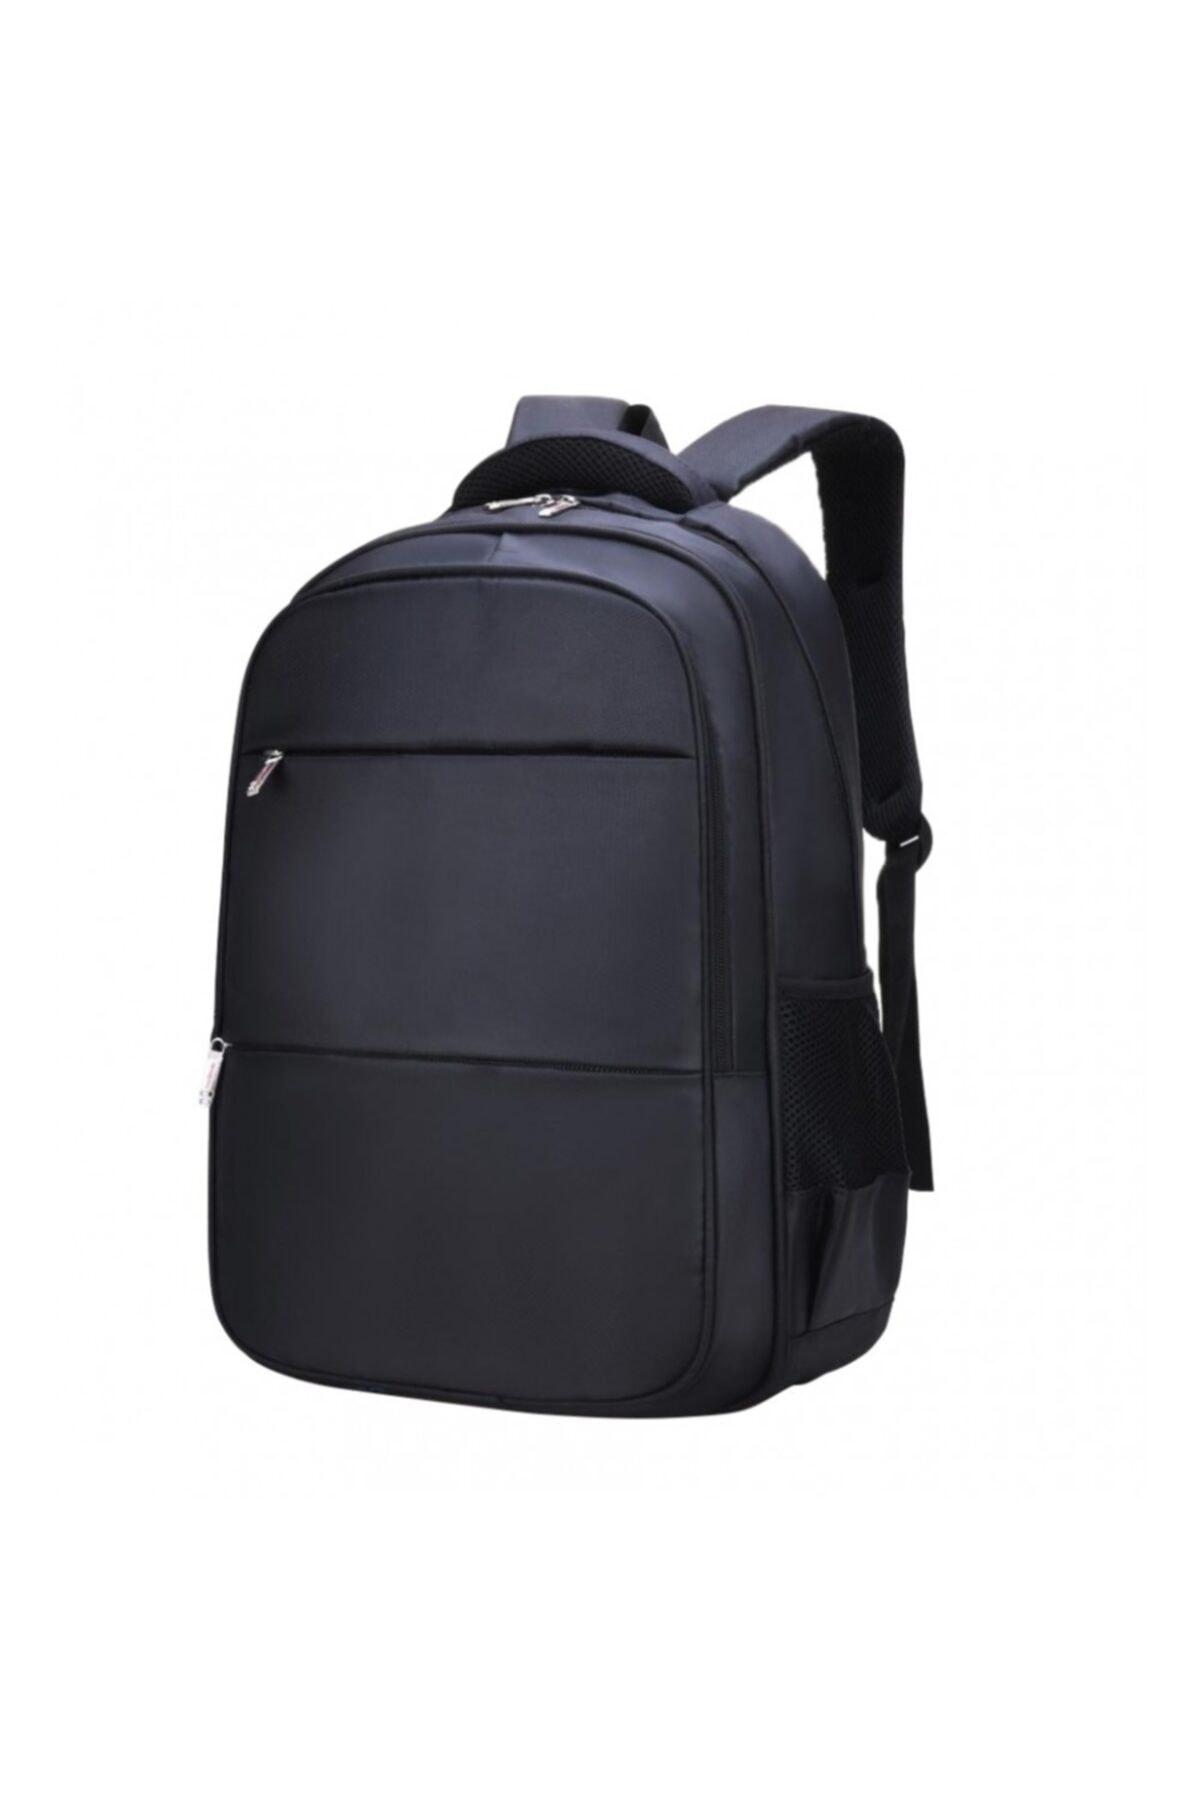 SYG Laptop/notebook Sırt Çantası (17 Inç) Siyah 2